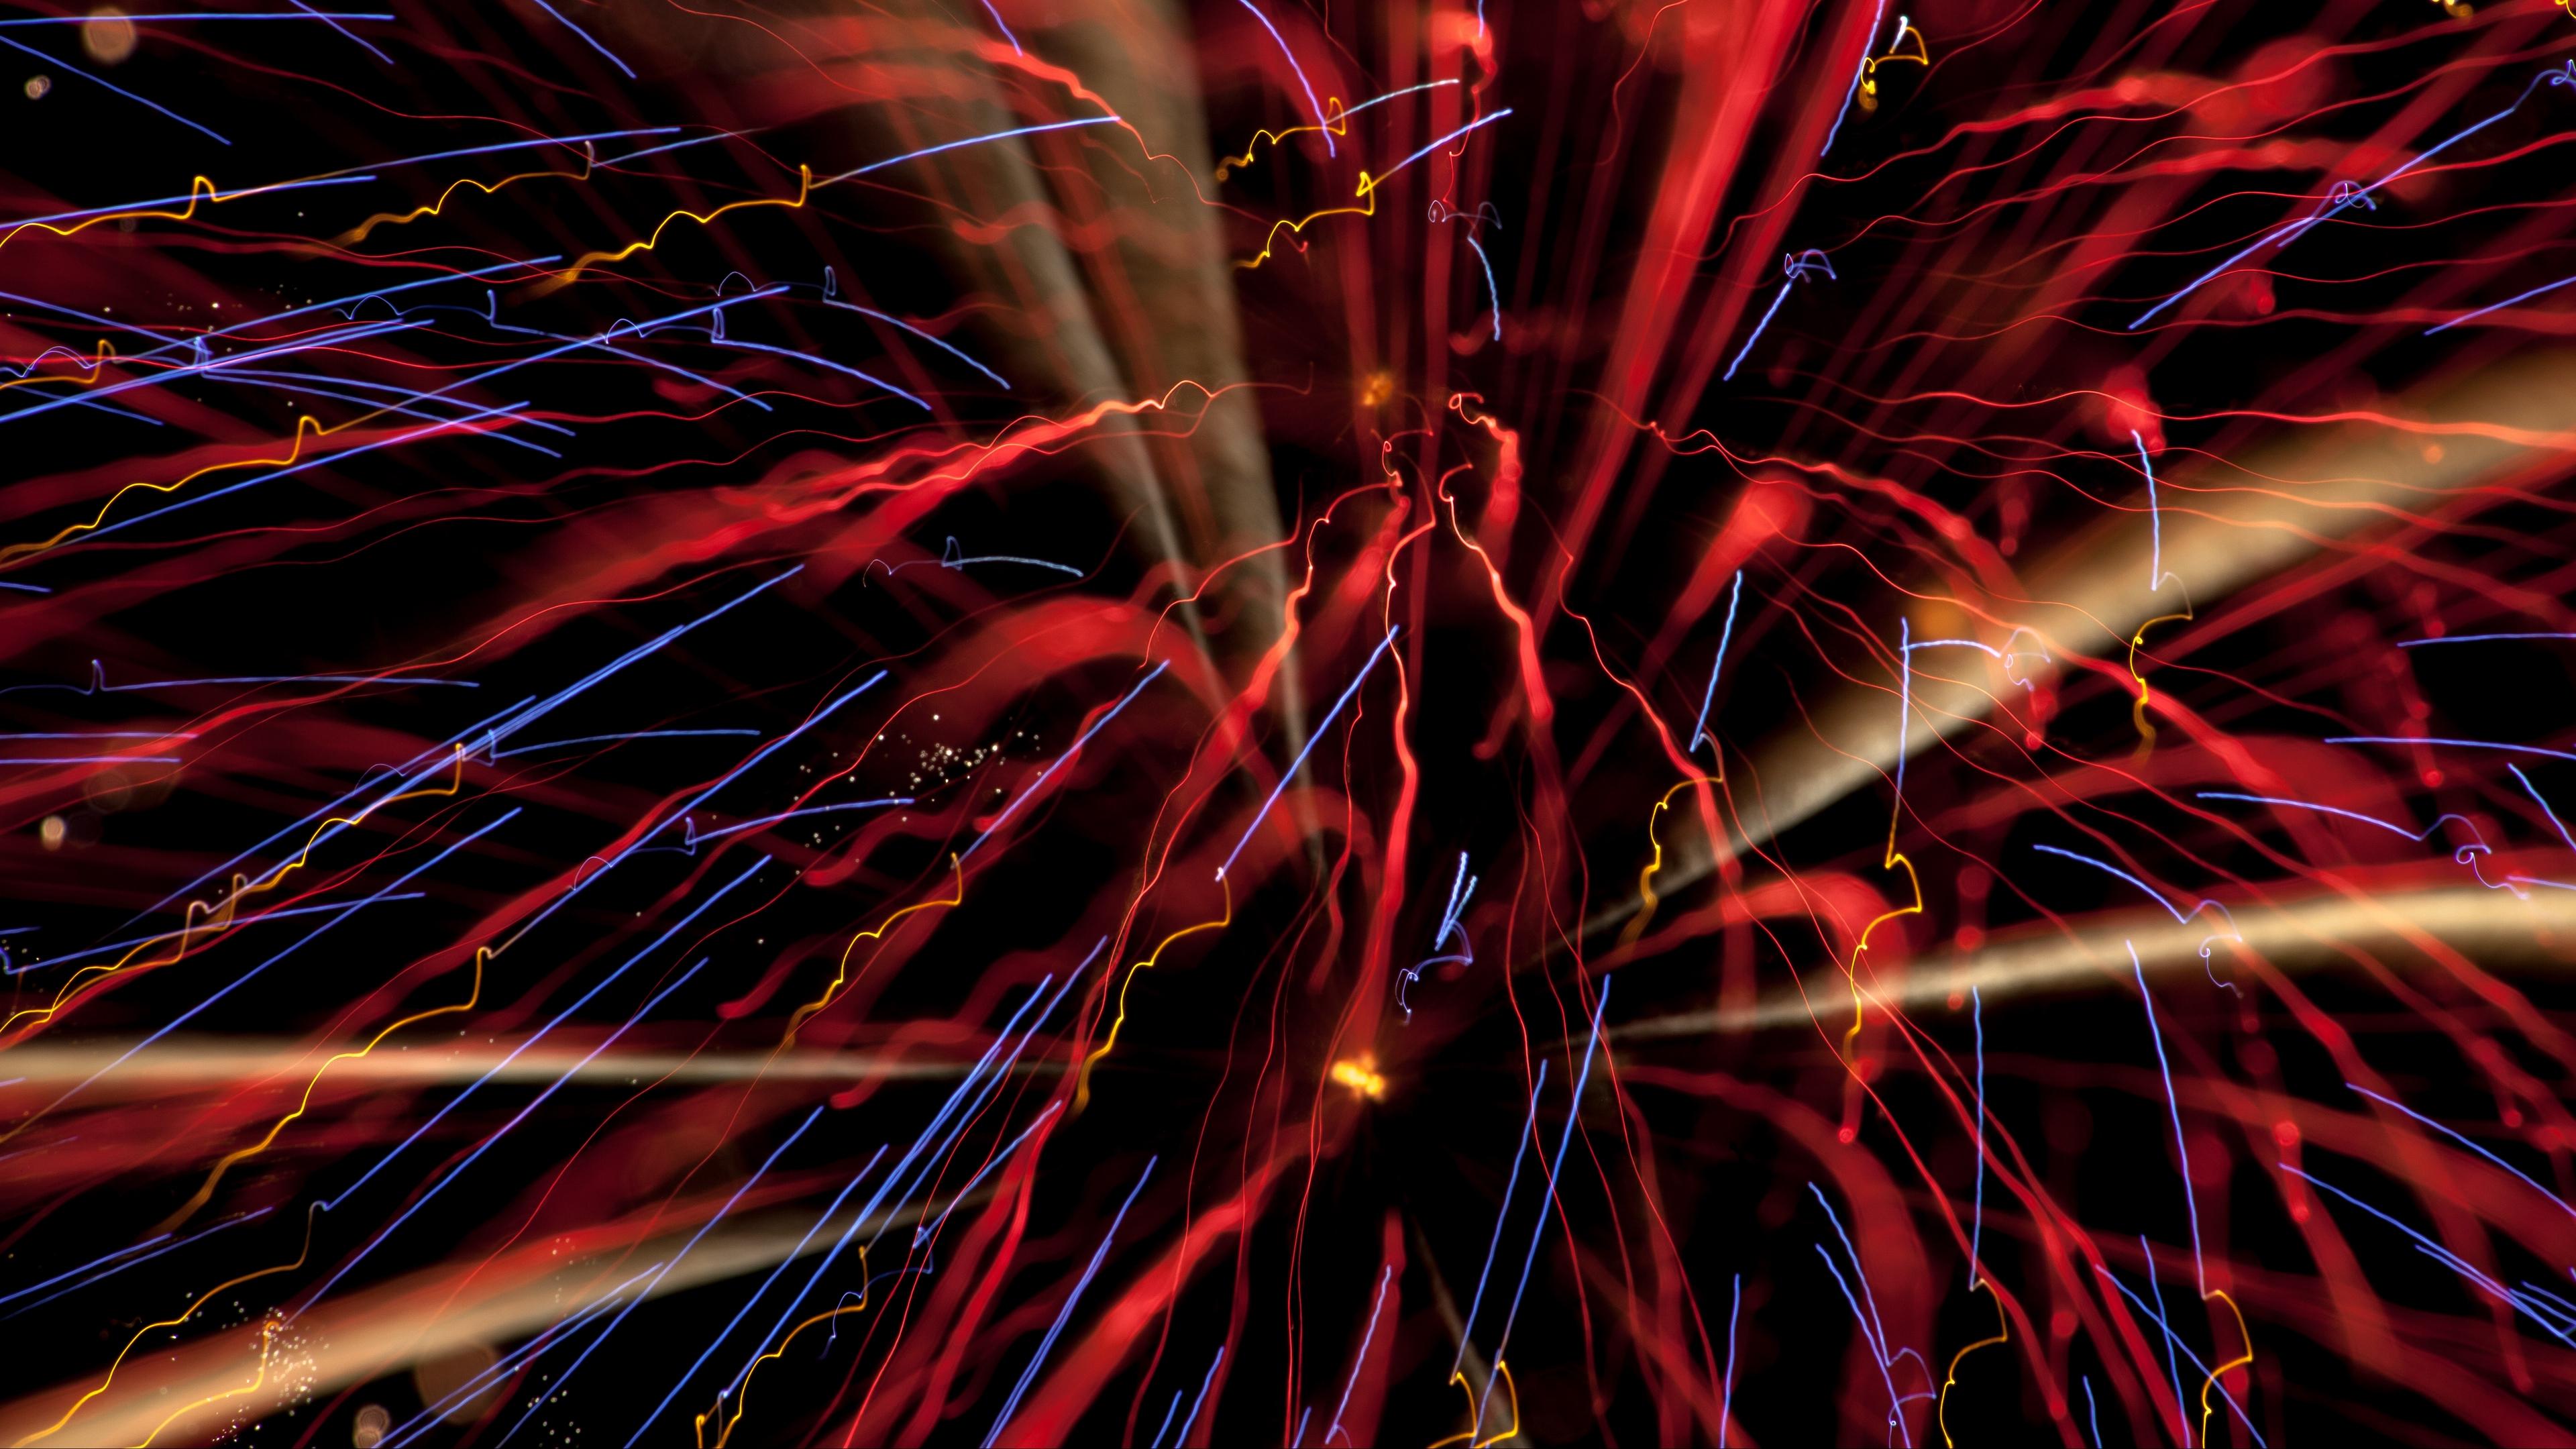 fireworks salute sparks rays red 4k 1539369878 - fireworks, salute, sparks, rays, red 4k - Sparks, salute, Fireworks